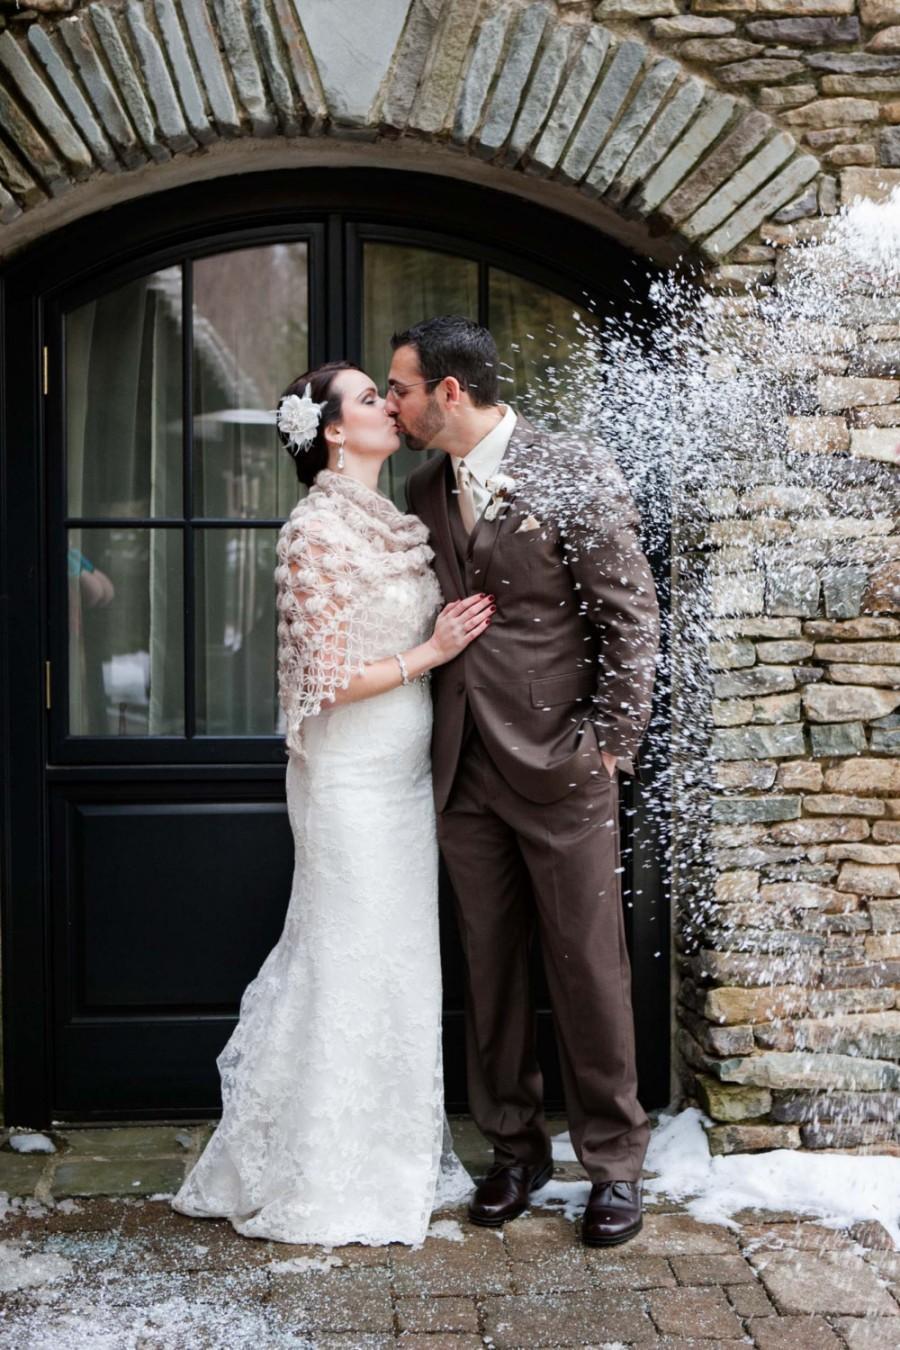 زفاف - Bridal Wrap,Shawl,Wedding Shawl,Bridal accessories,Bridal Shawl,Bridal Bolero,Winter Wedding,Crochet Shawl